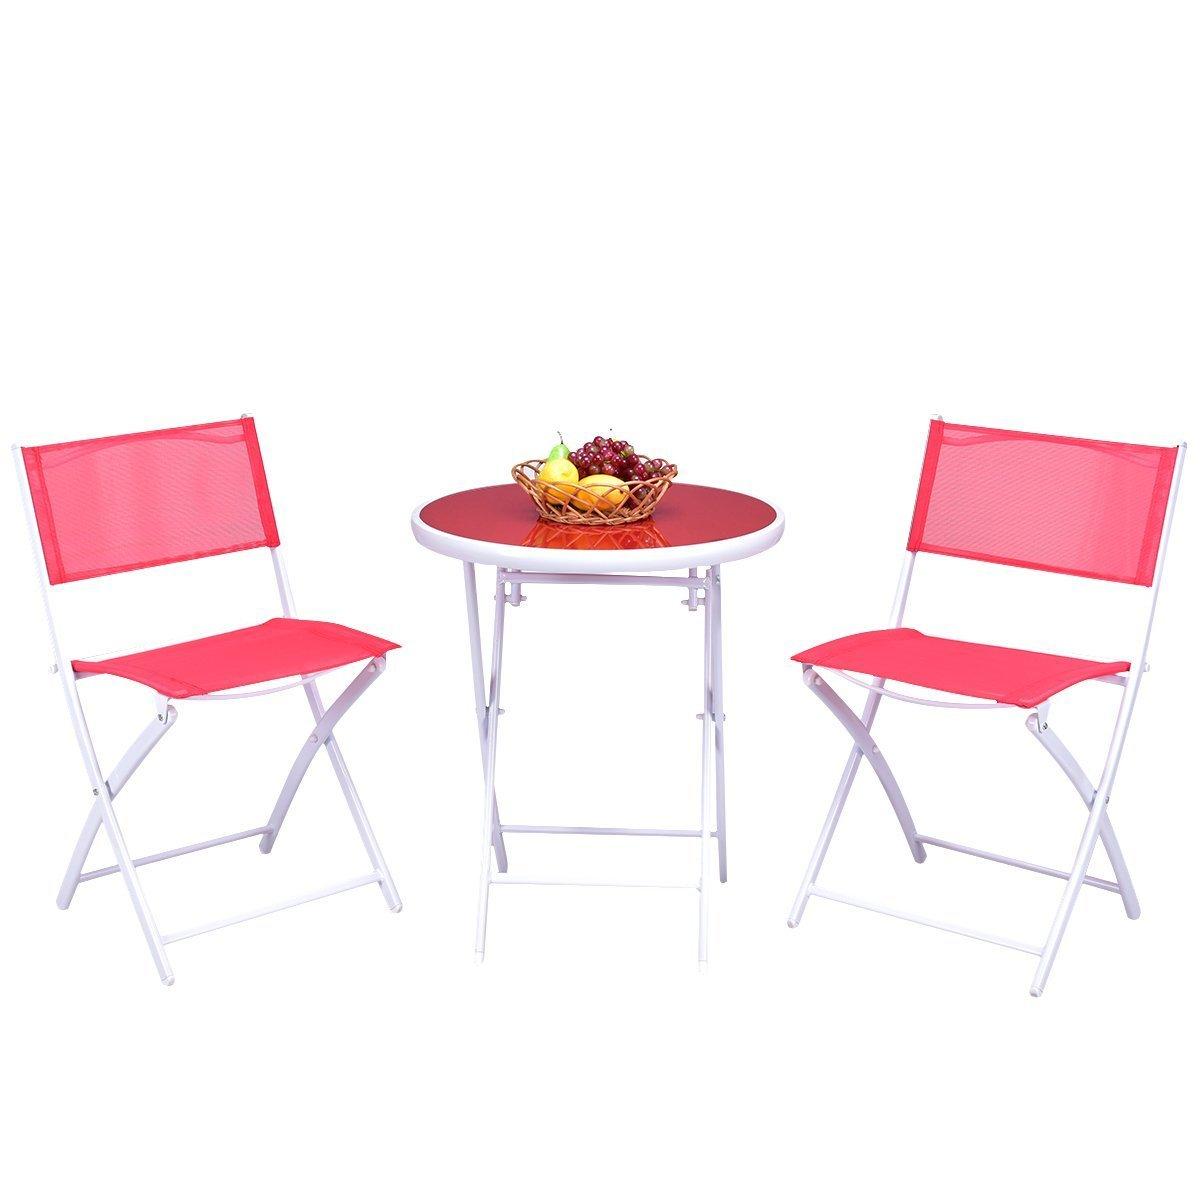 Small Folding Garden Table Side Patio Outdoor Coffee Tea Drinks Glass Furniture⭐